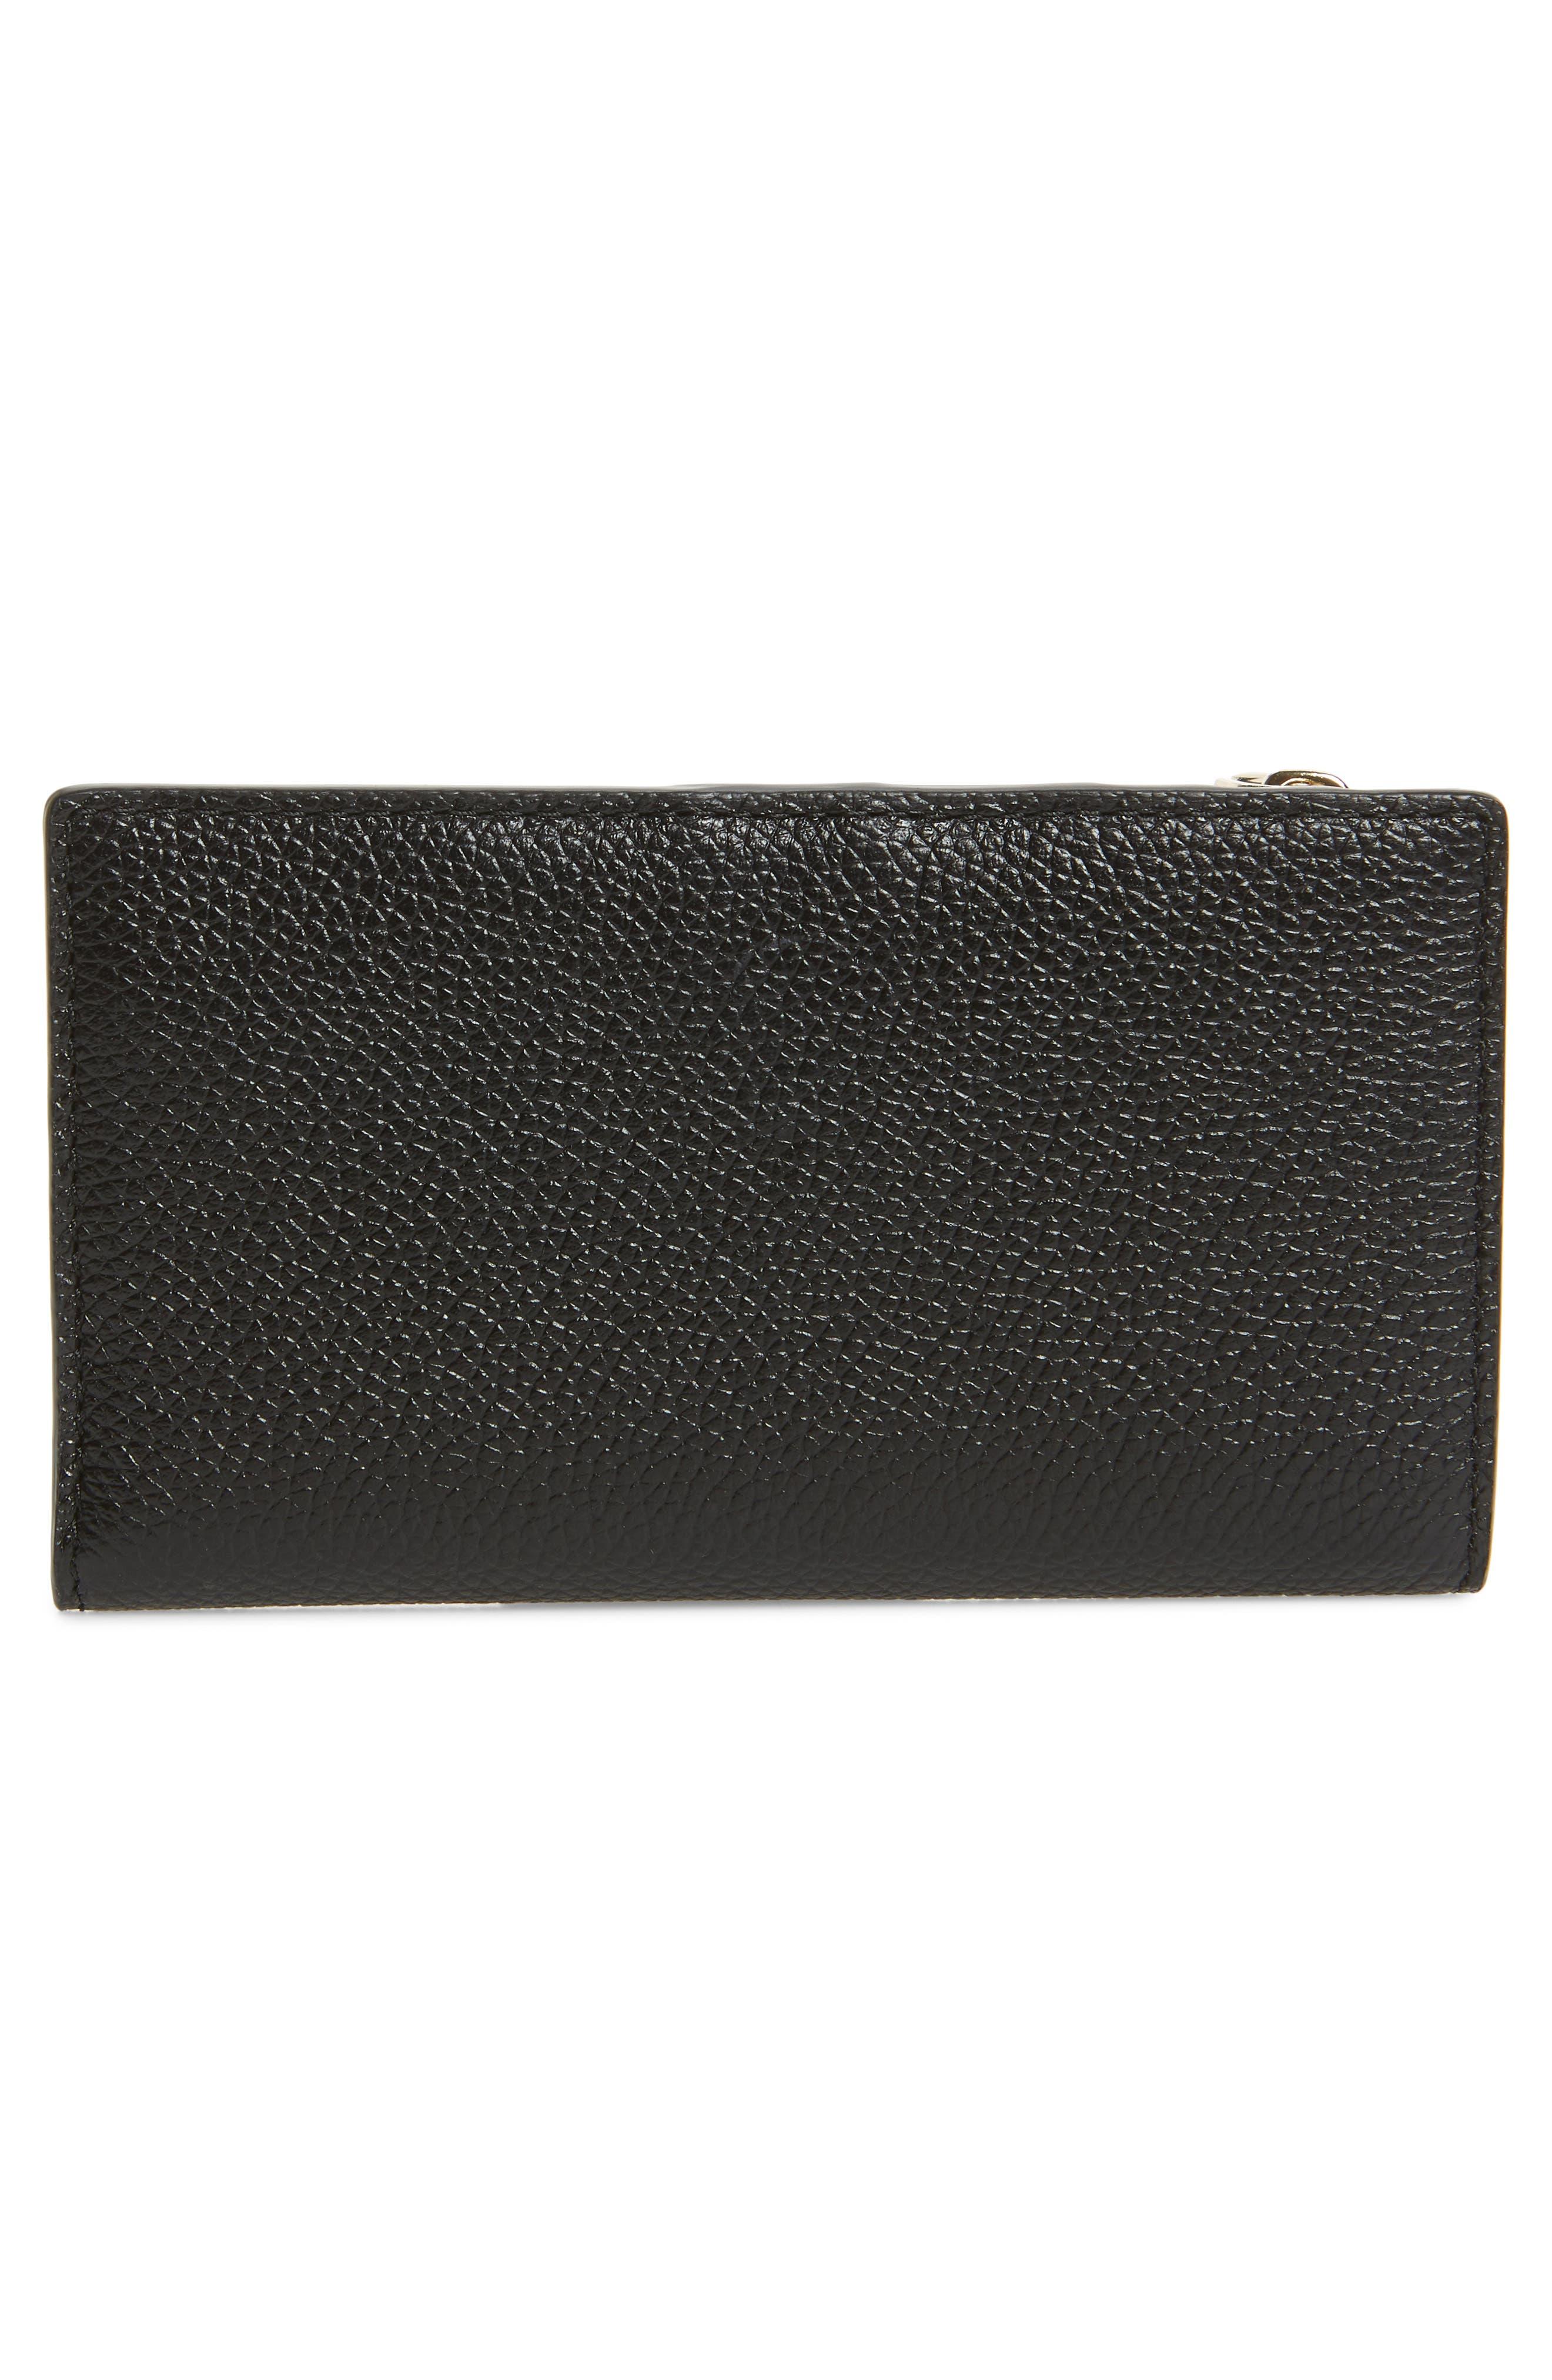 KATE SPADE NEW YORK,                             margaux slim bifold wallet,                             Alternate thumbnail 4, color,                             BLACK